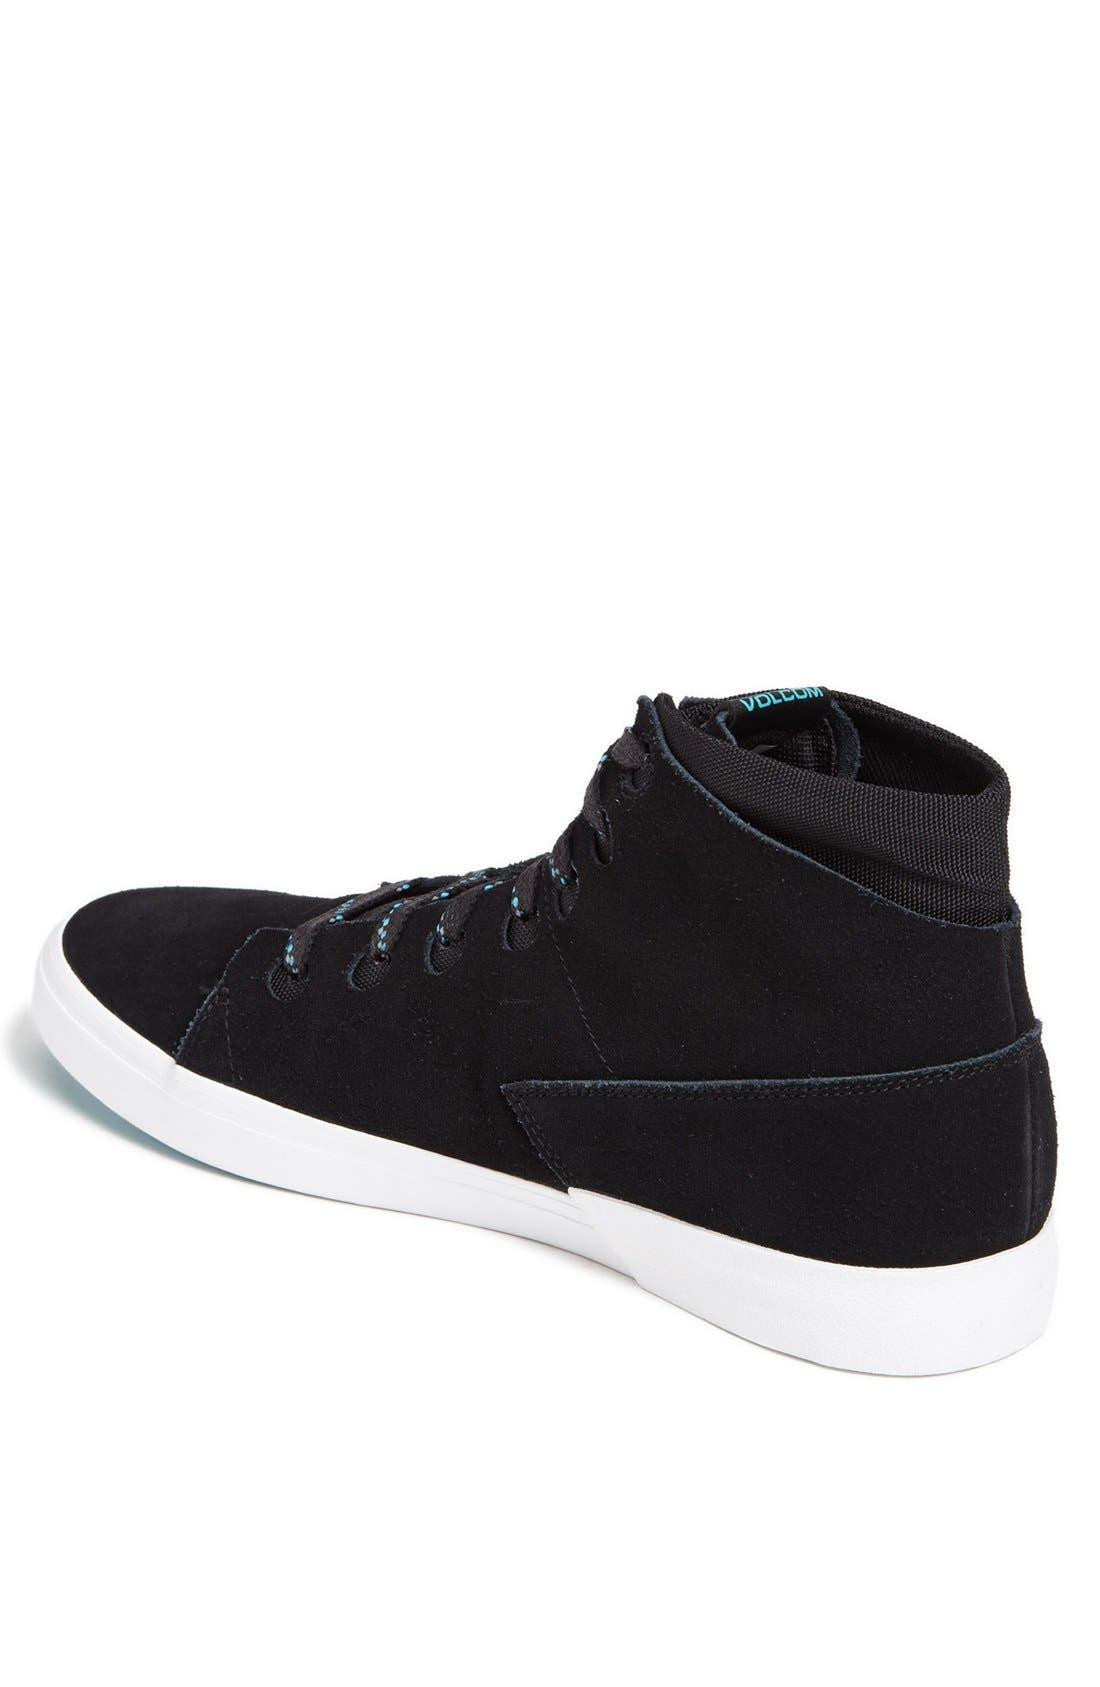 Alternate Image 2  - Volcom 'Buzzard' Sneaker